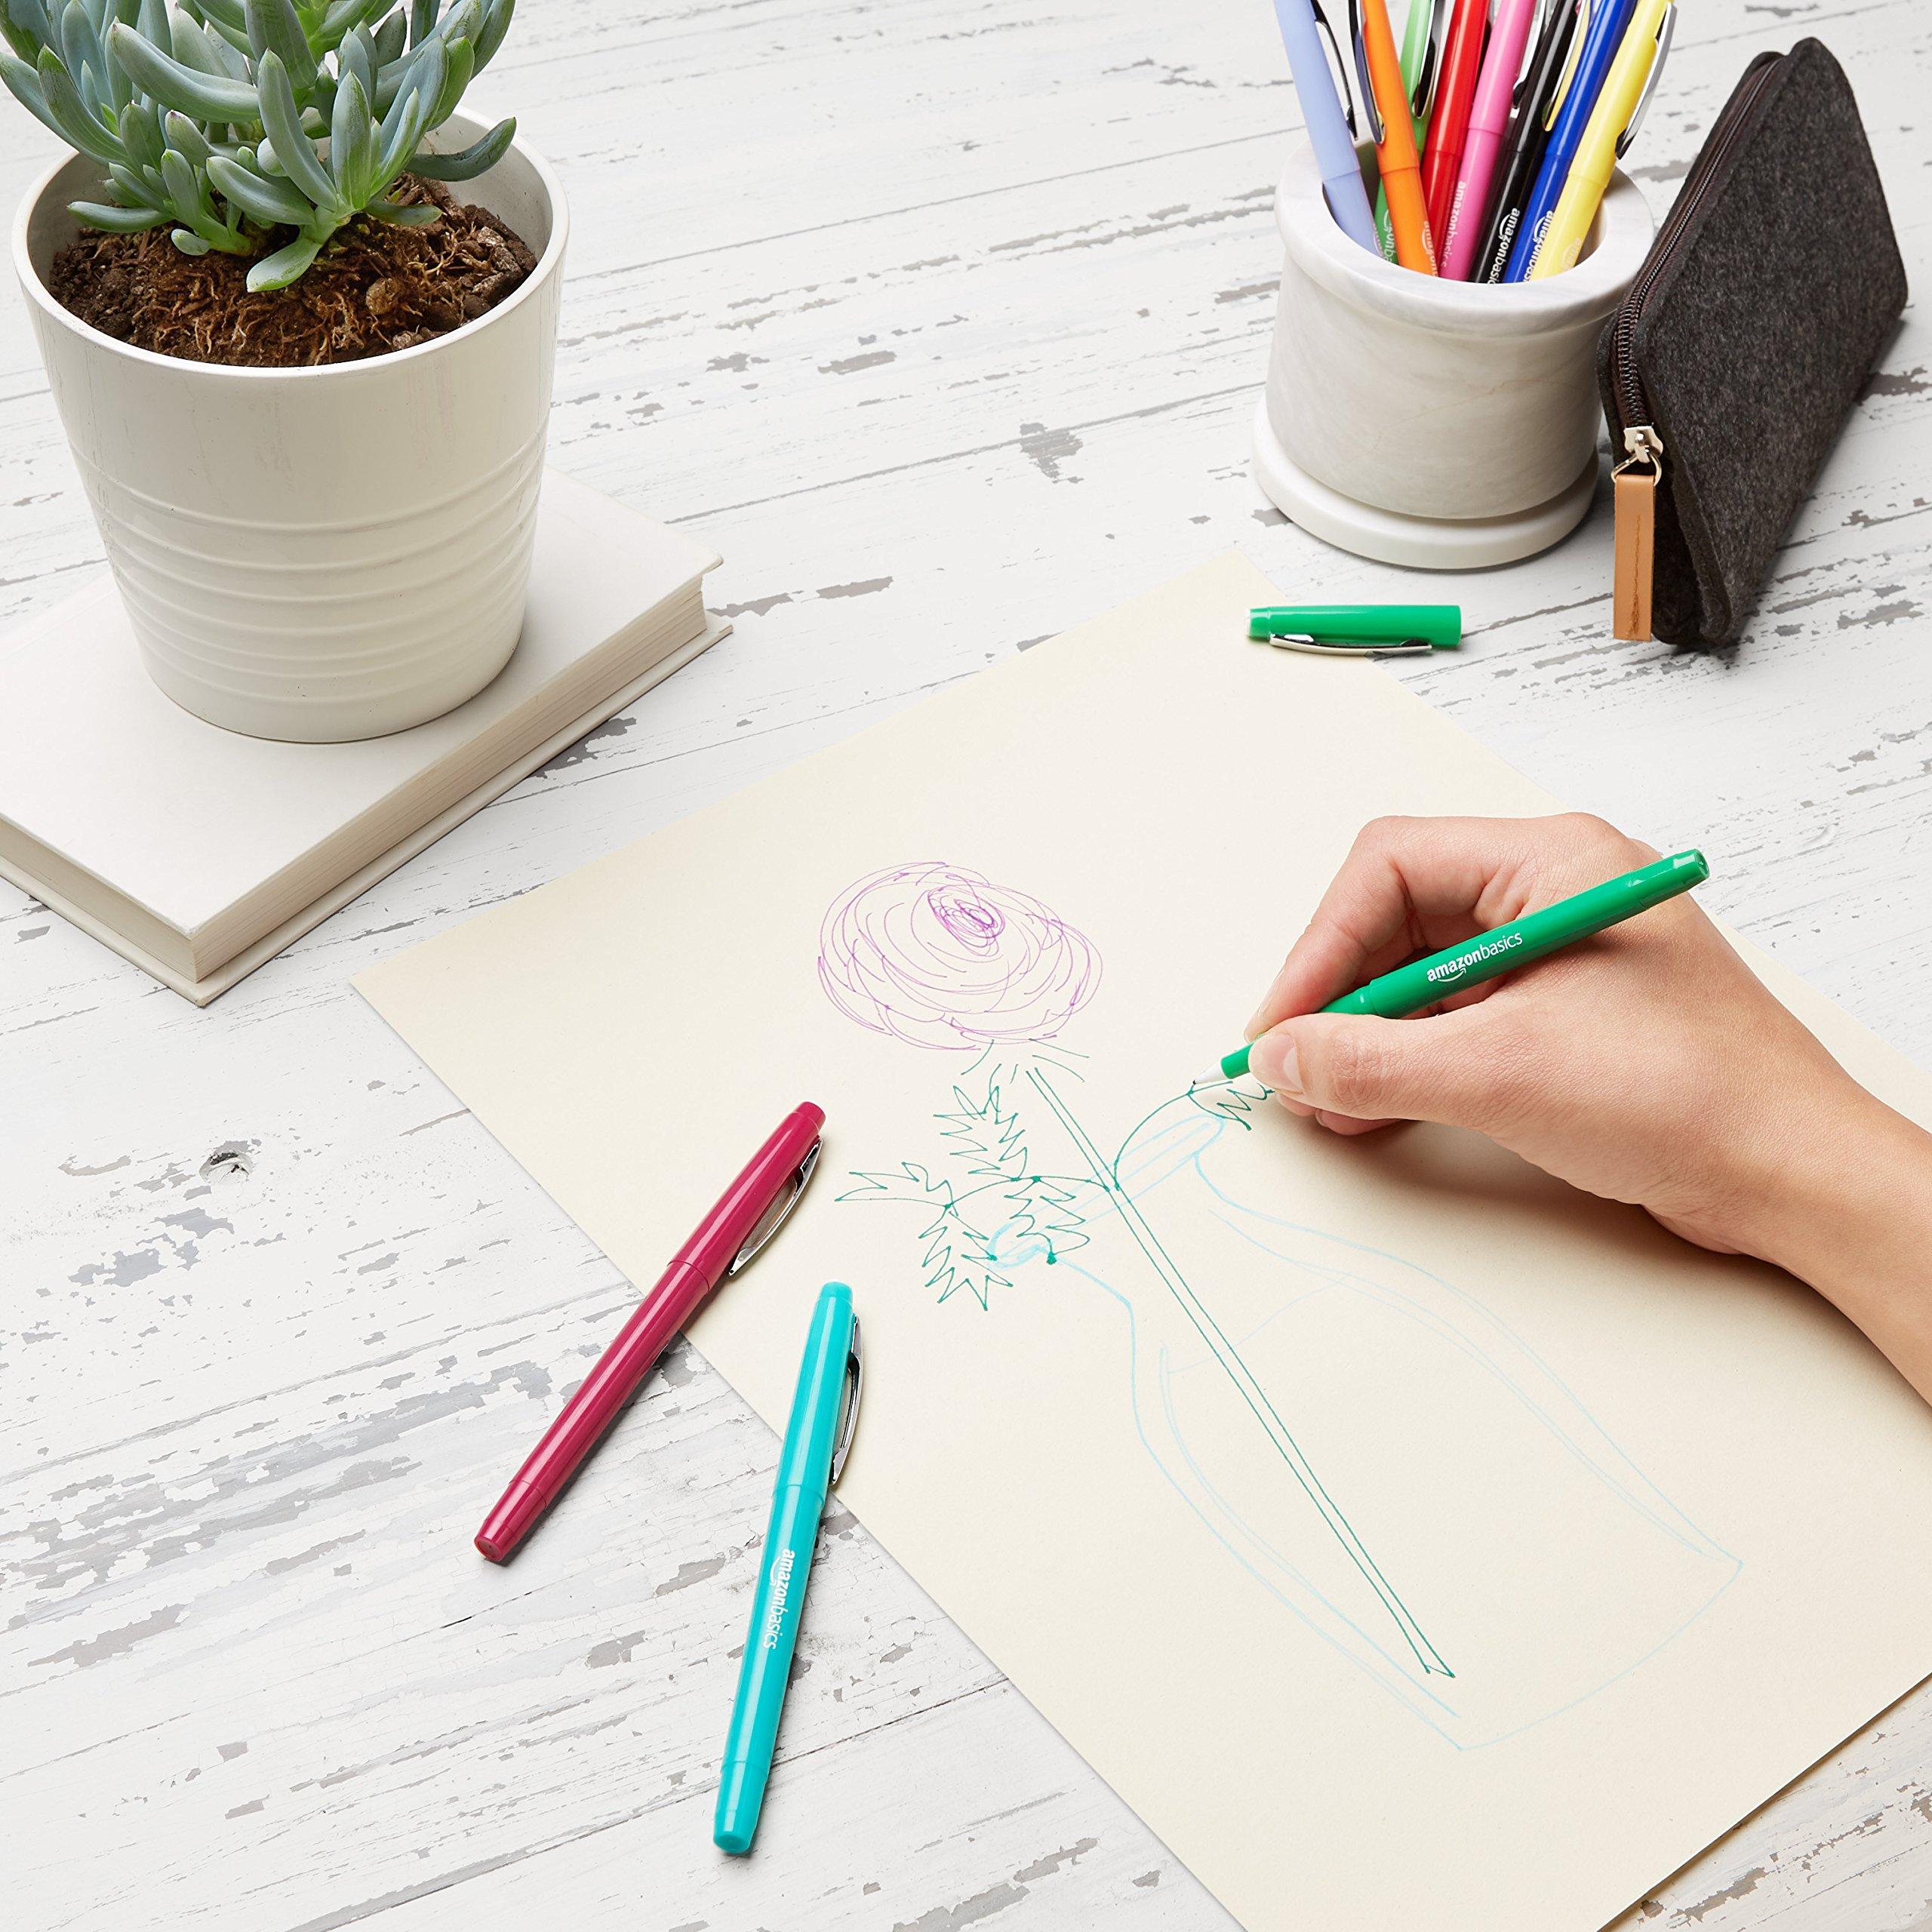 AmazonBasics Felt Tip Pens - 24 Assorted Colors by AmazonBasics (Image #3)